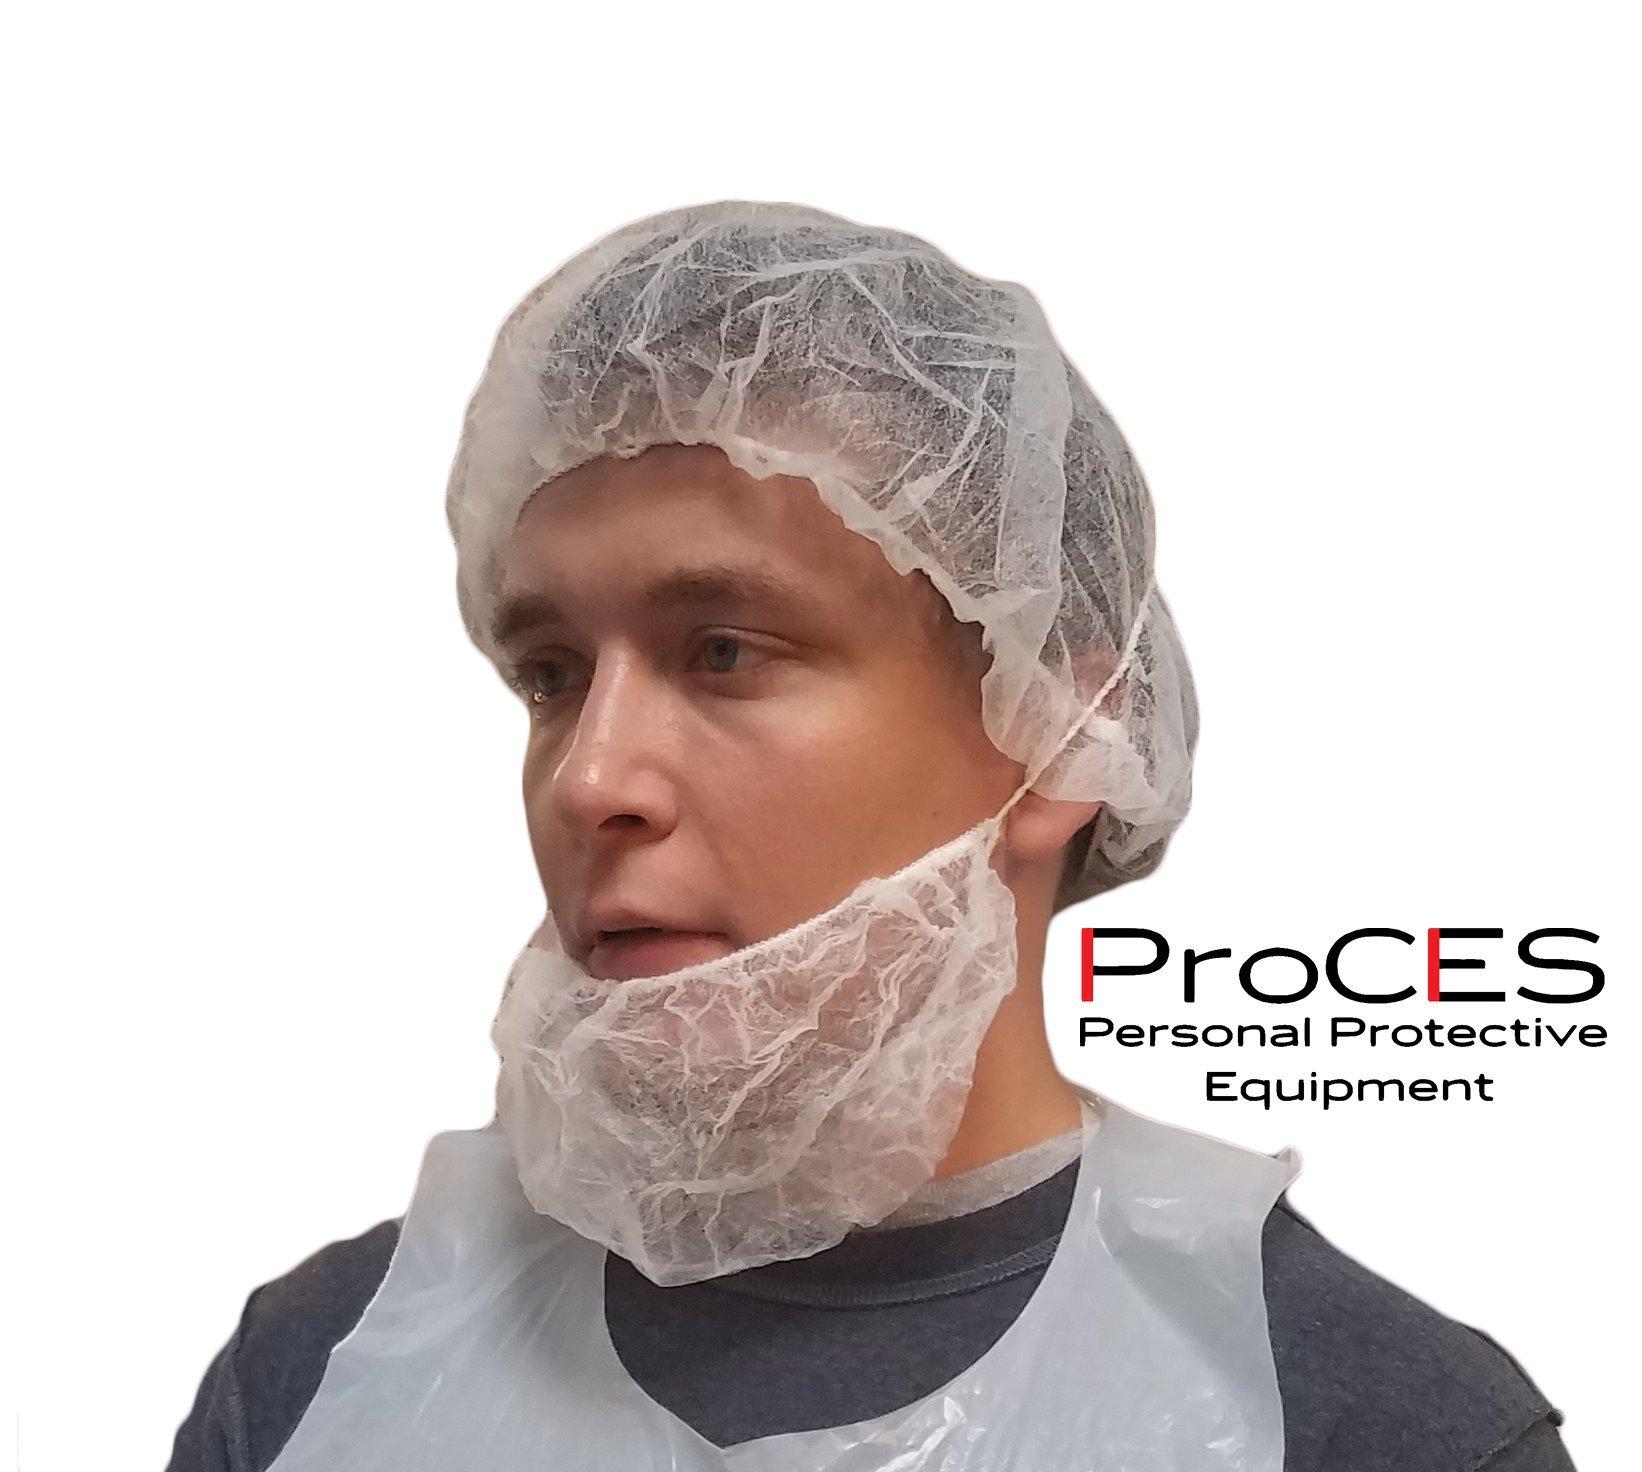 ProCES Disposable White Hairnet - 100 Pack - Bouffant Cap - Polypropylene - 21'' -